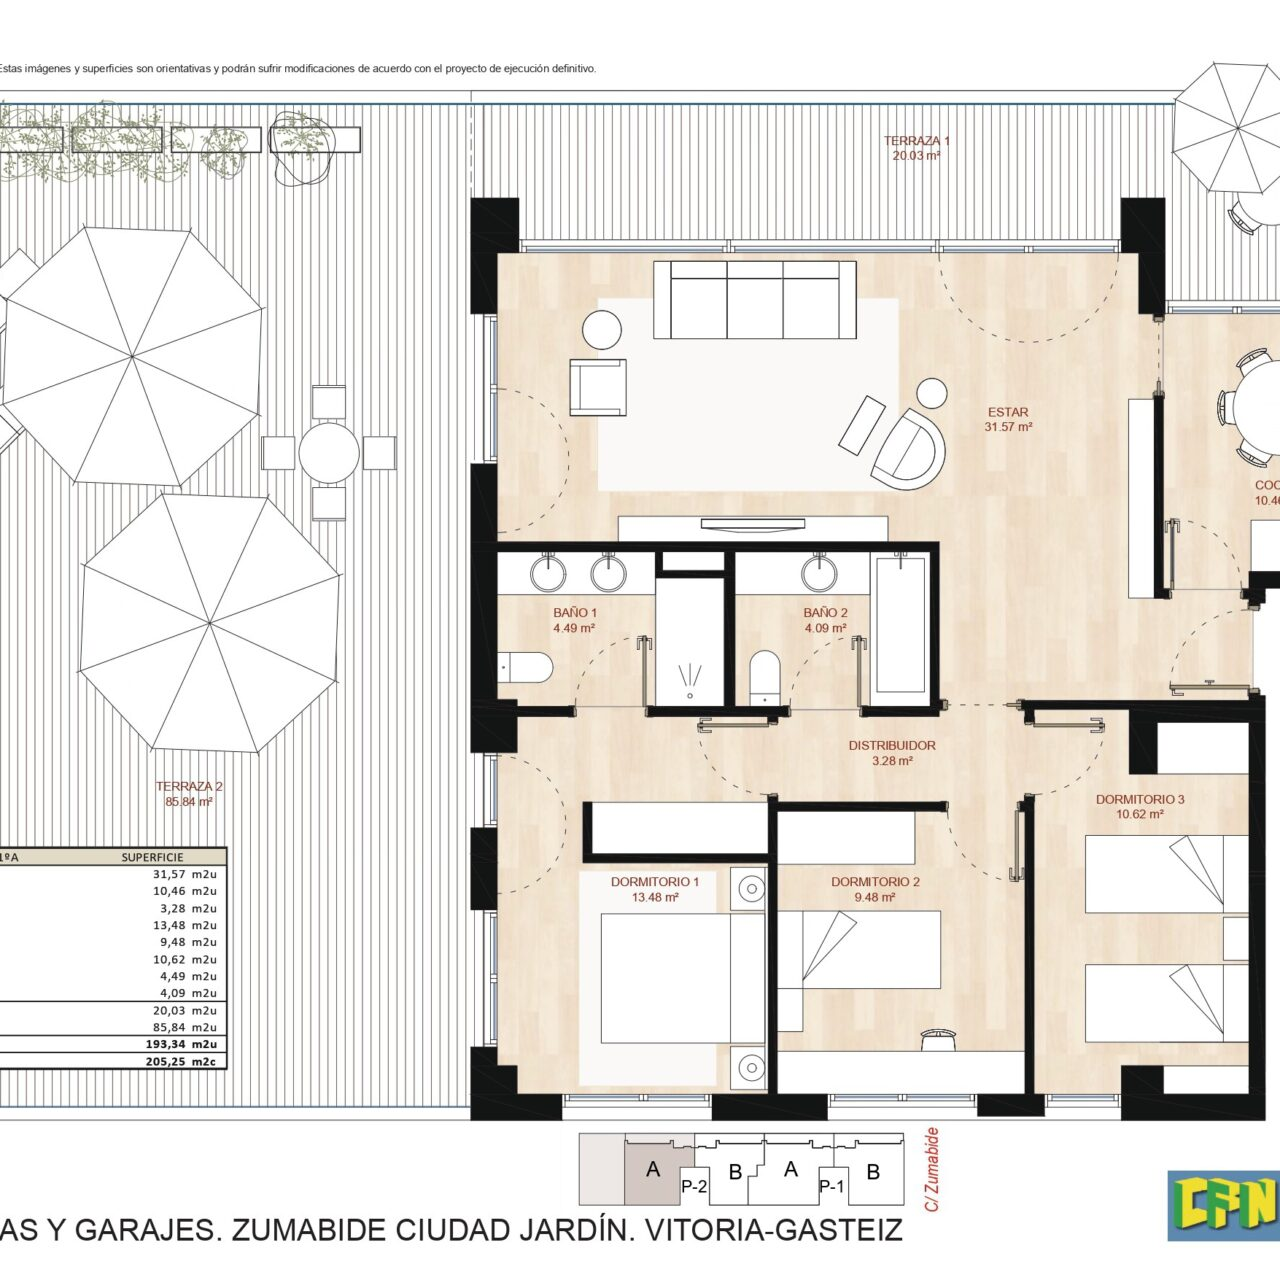 http://www.zumabideciudadjardin.com/wp-content/uploads/2021/06/3-DORMITORIOS-PRIMERO-CON-GRAN-TERRAZA-A-SUR-1280x1280.jpg